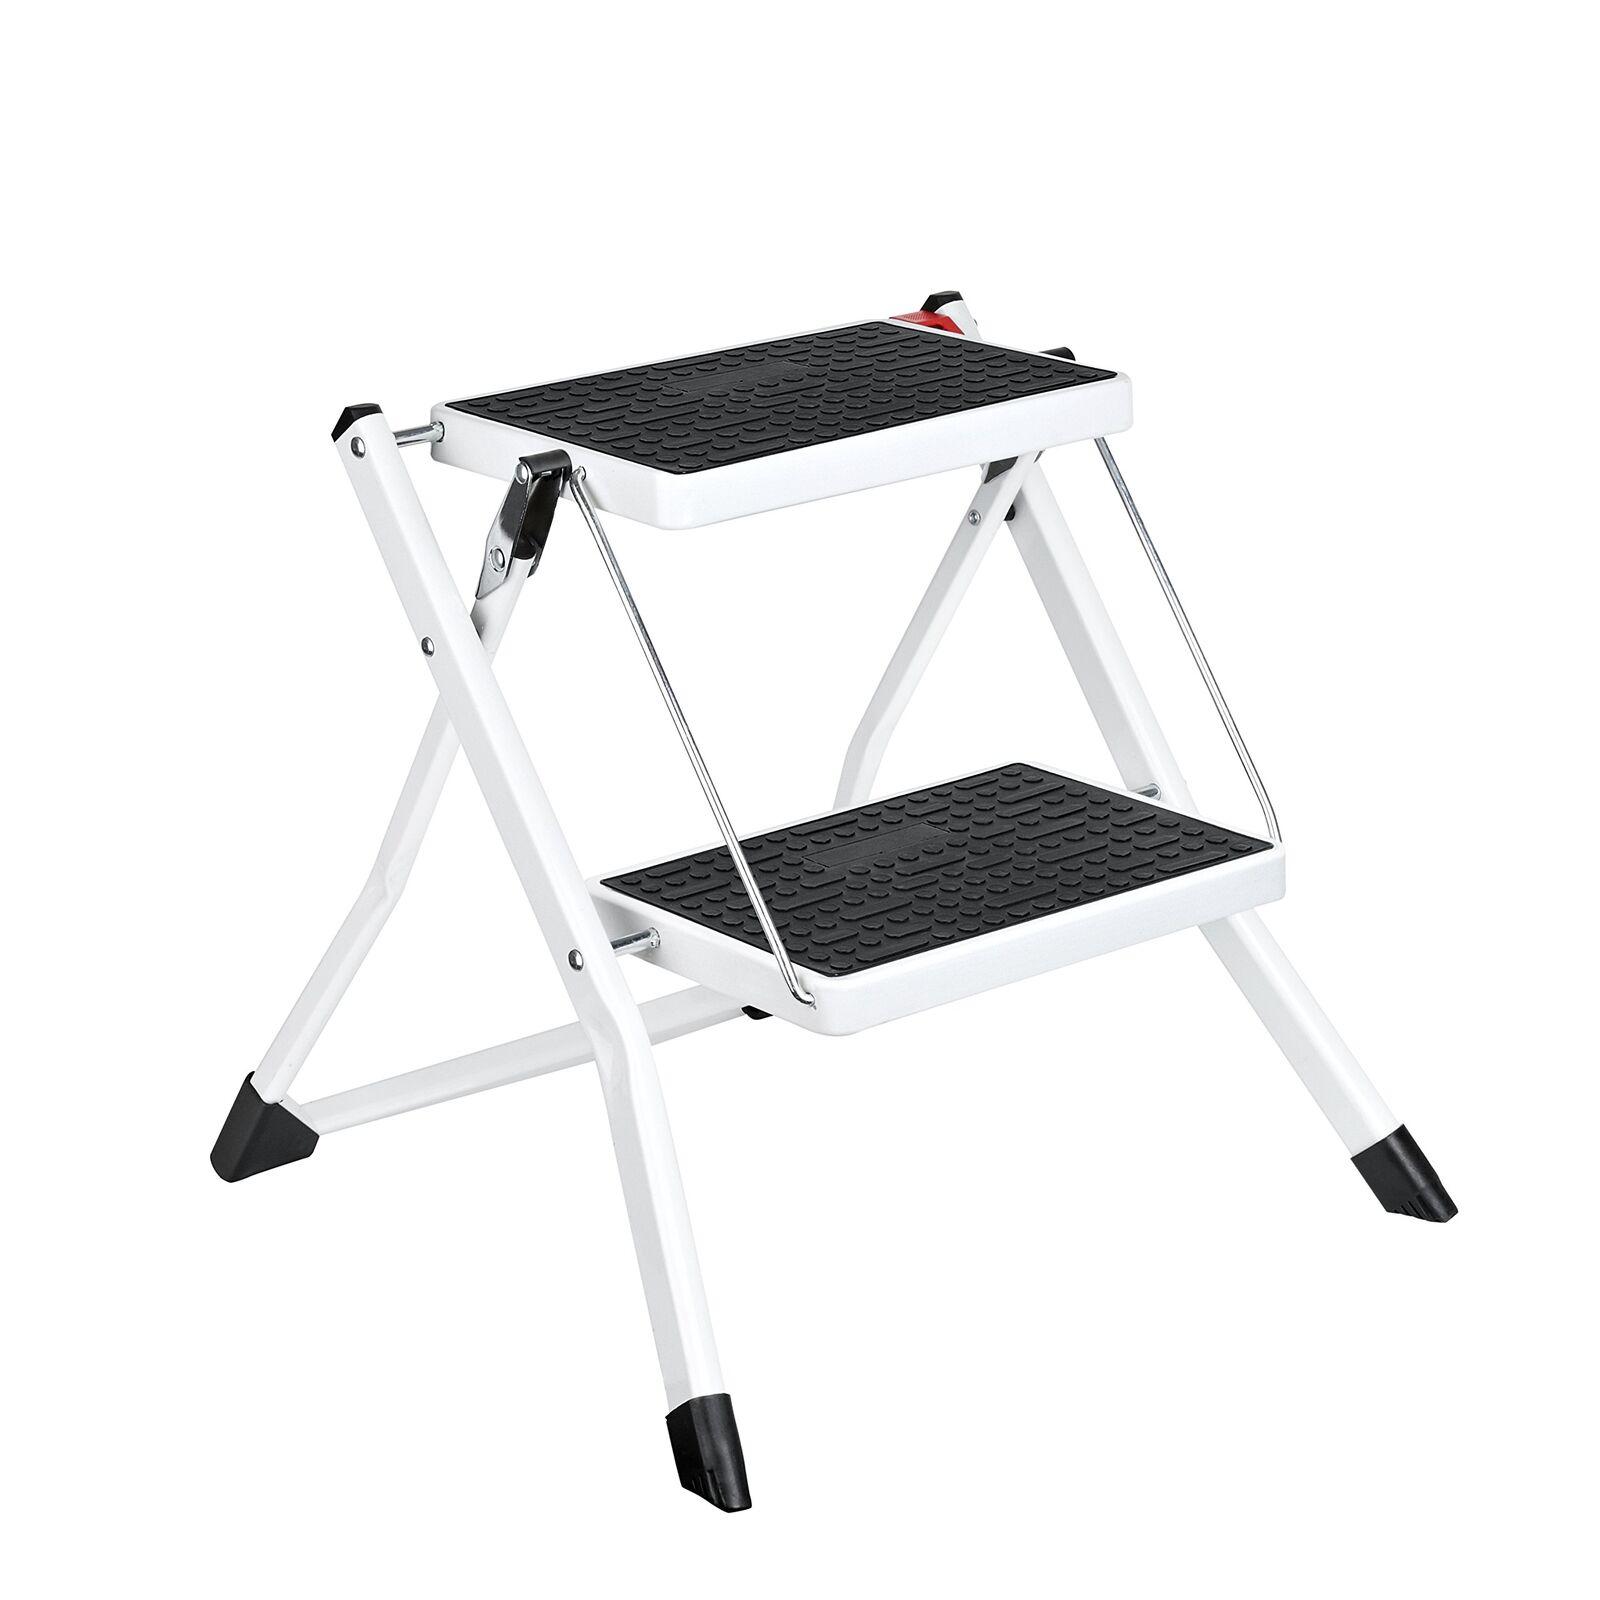 Delxo Step Stool Stepladders Lightweight White Folding Step Ladder with Handgrip